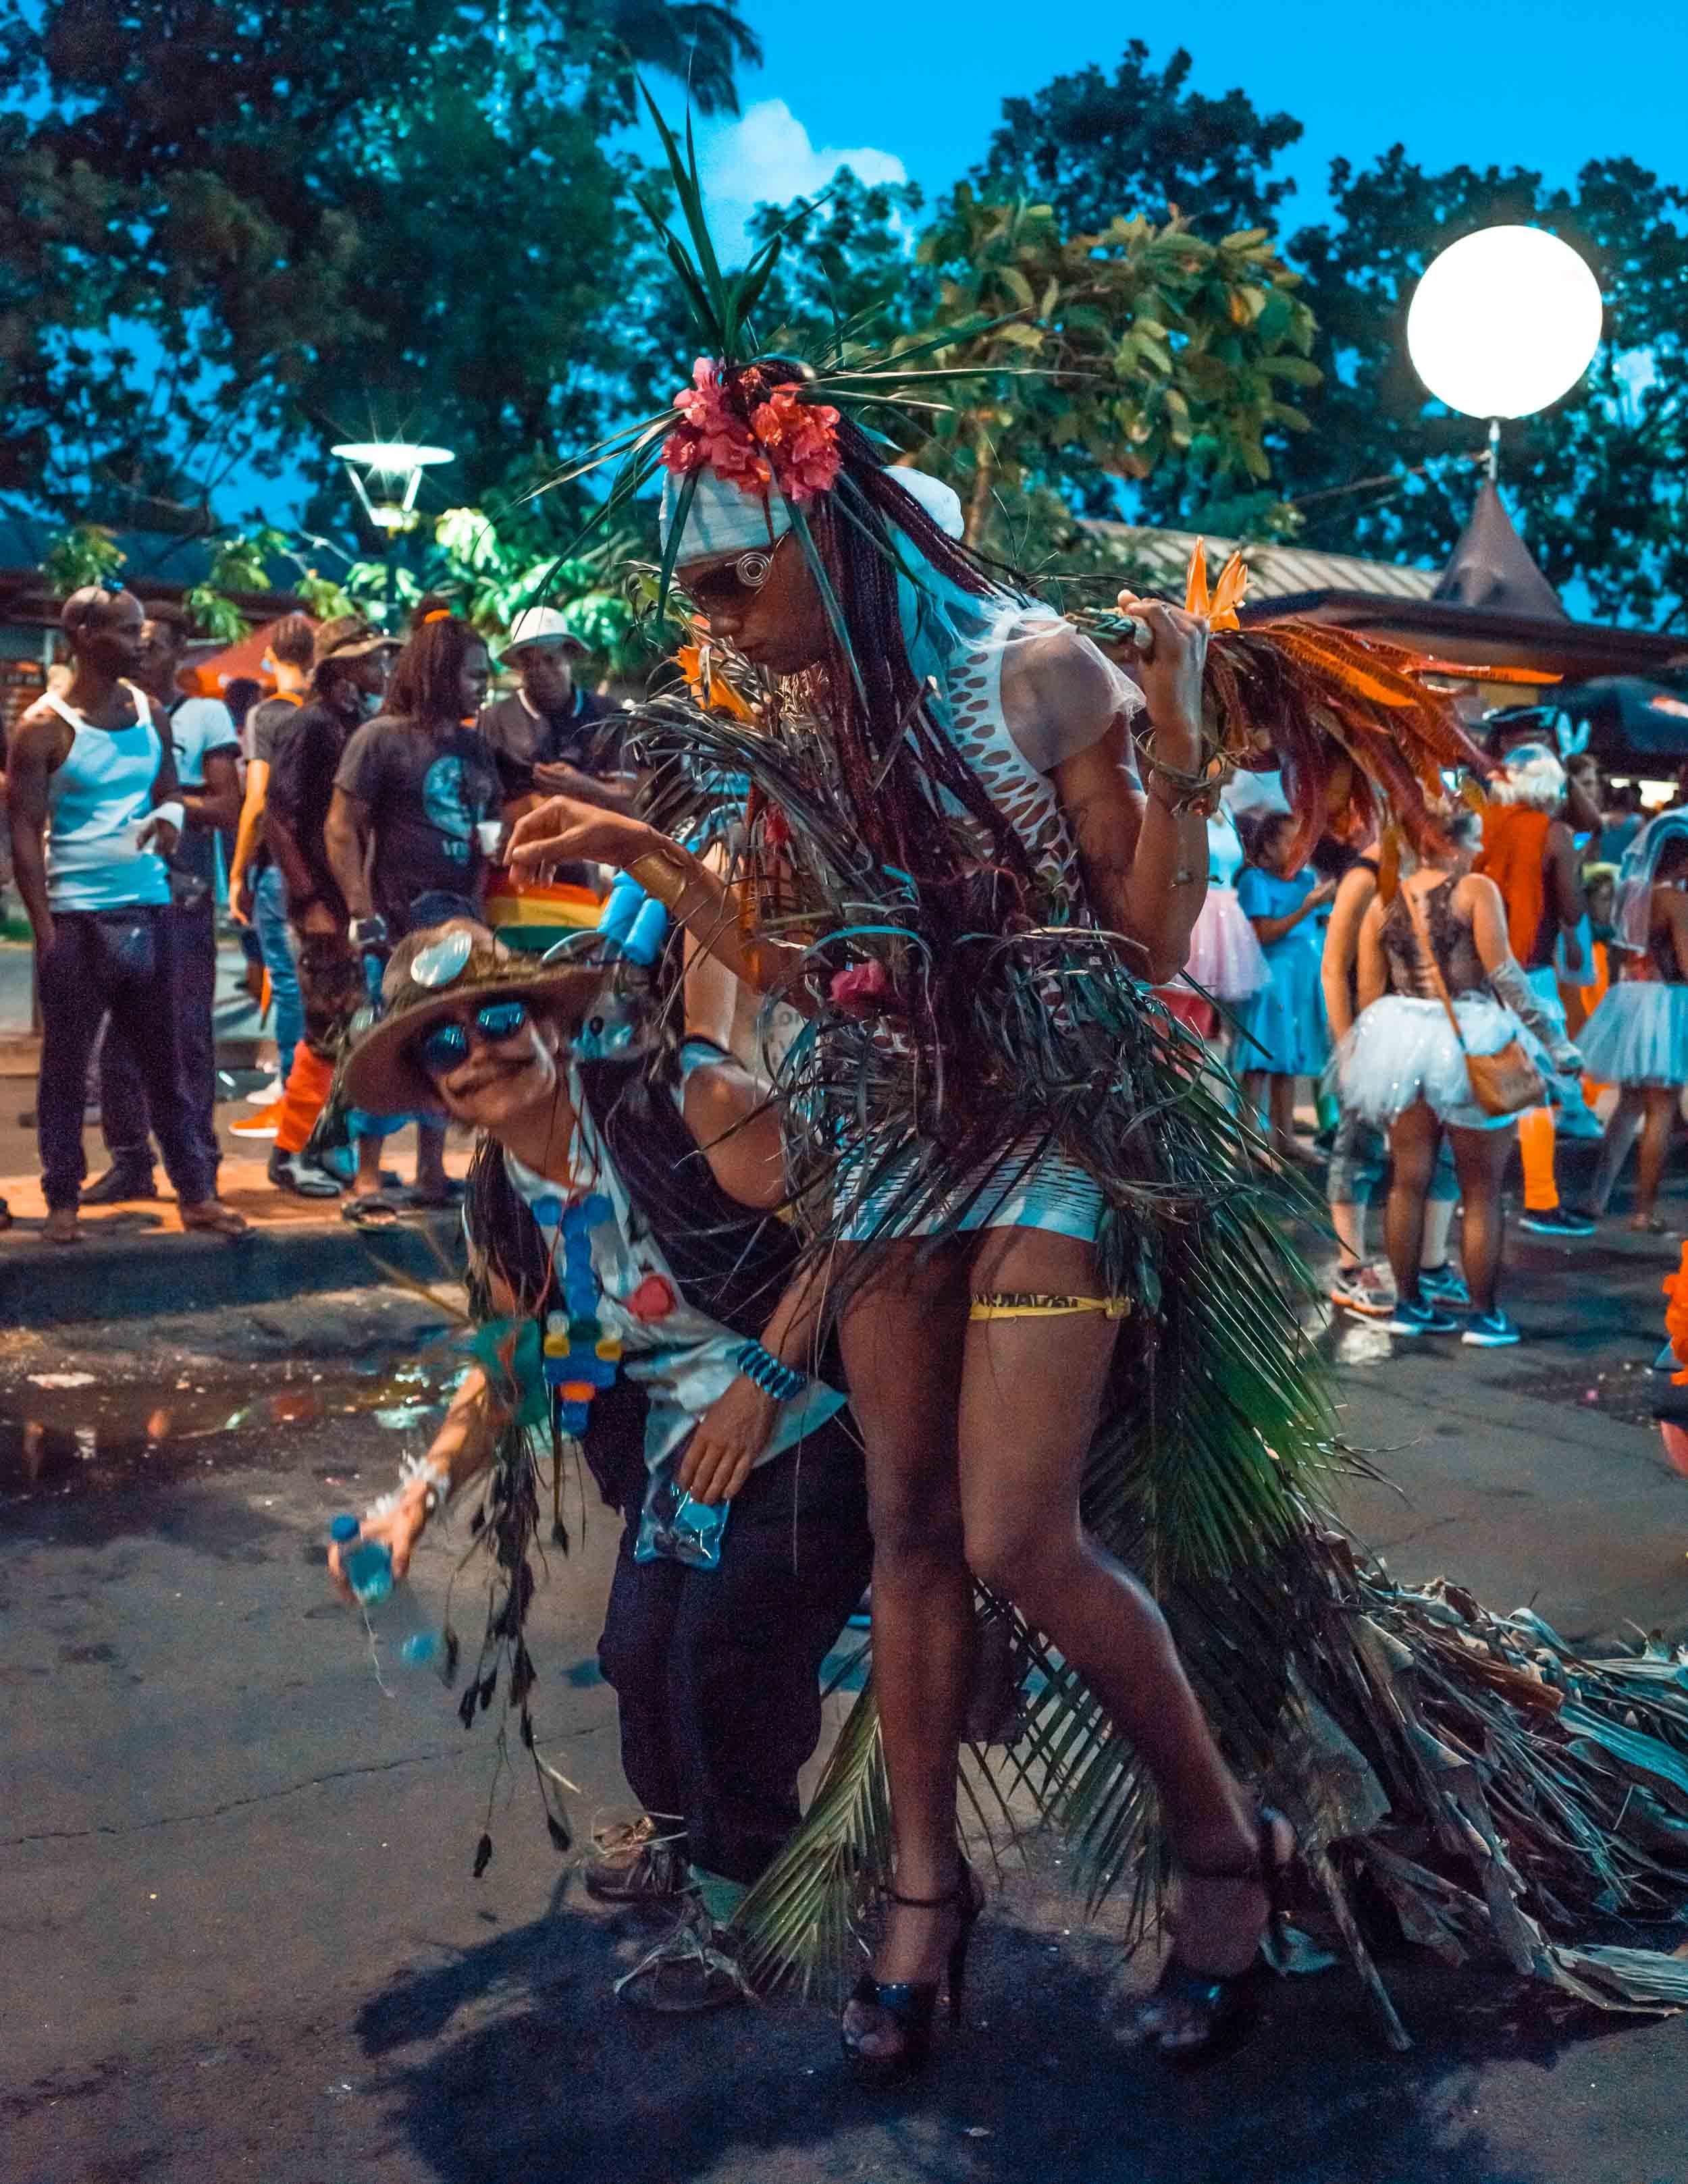 180212_SK_Martinique-68.jpg